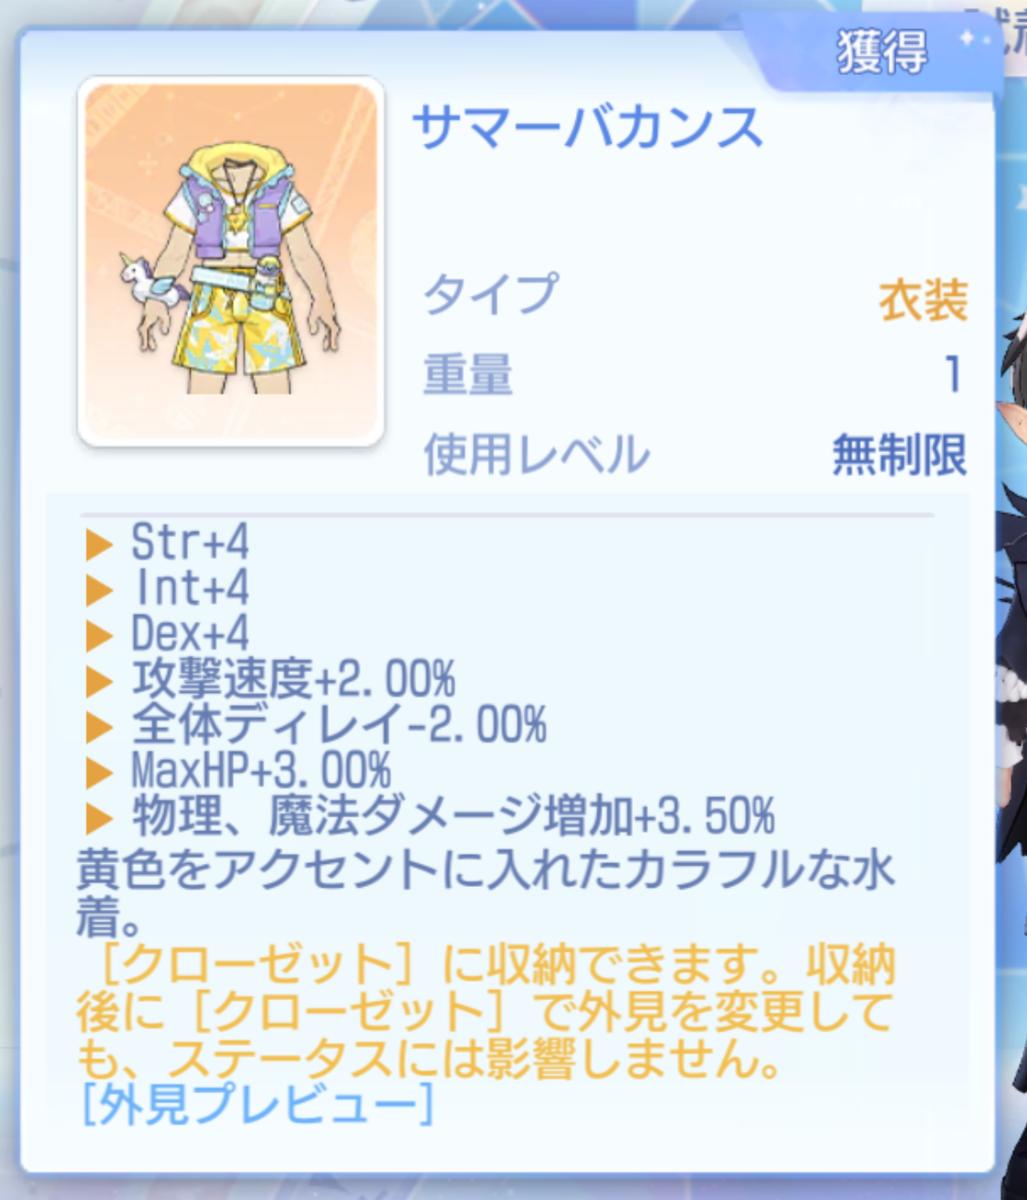 f:id:yamada_ragnarok:20210809121612p:plain